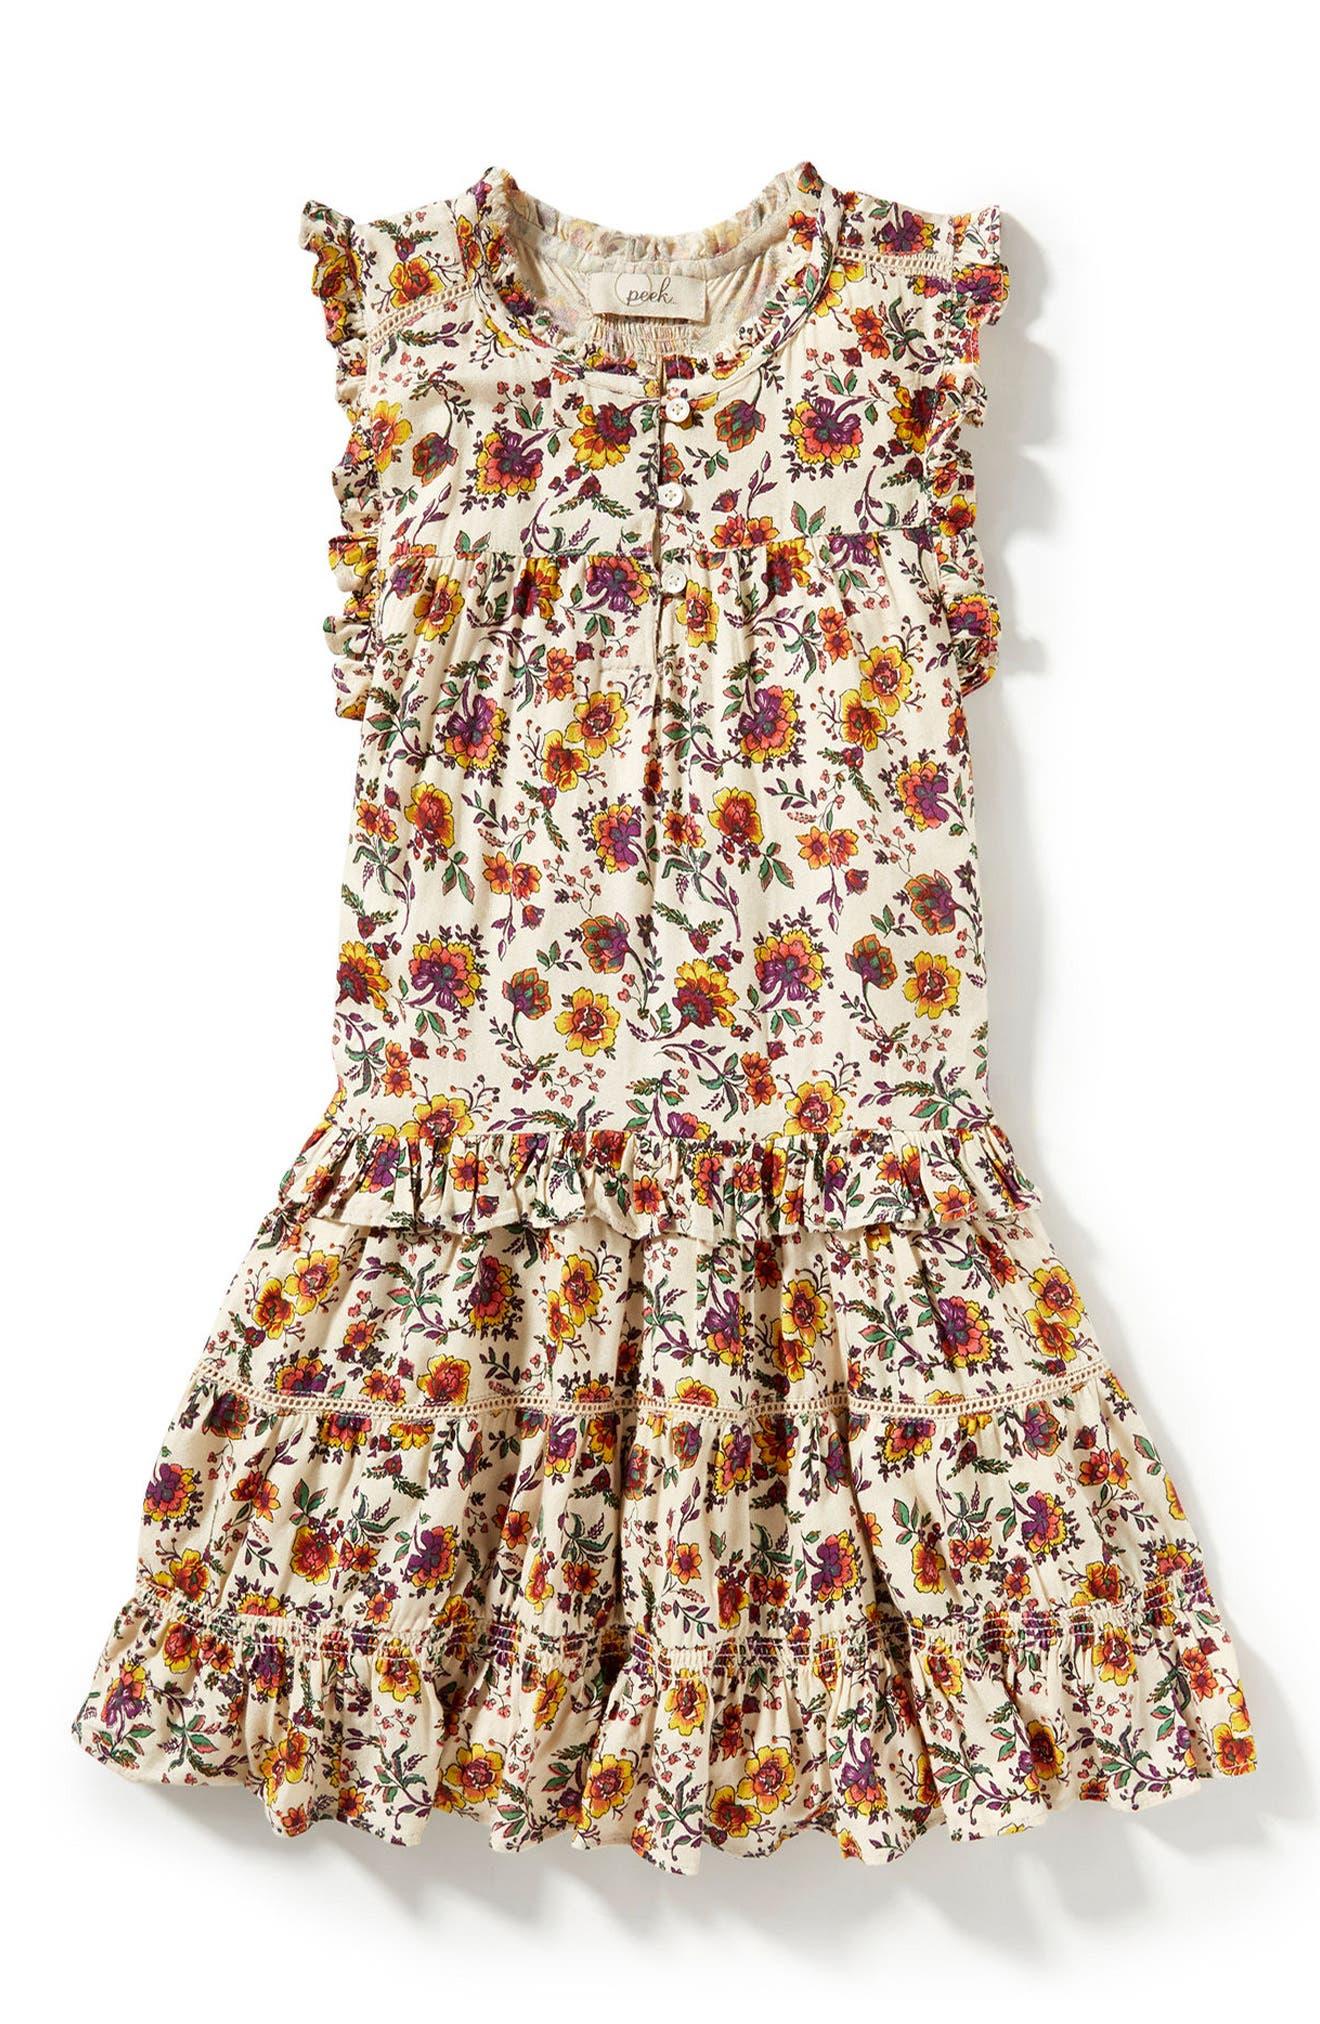 Main Image - Peek Natalie Print Dress (Toddler Girls, Little Girls & Big Girls)